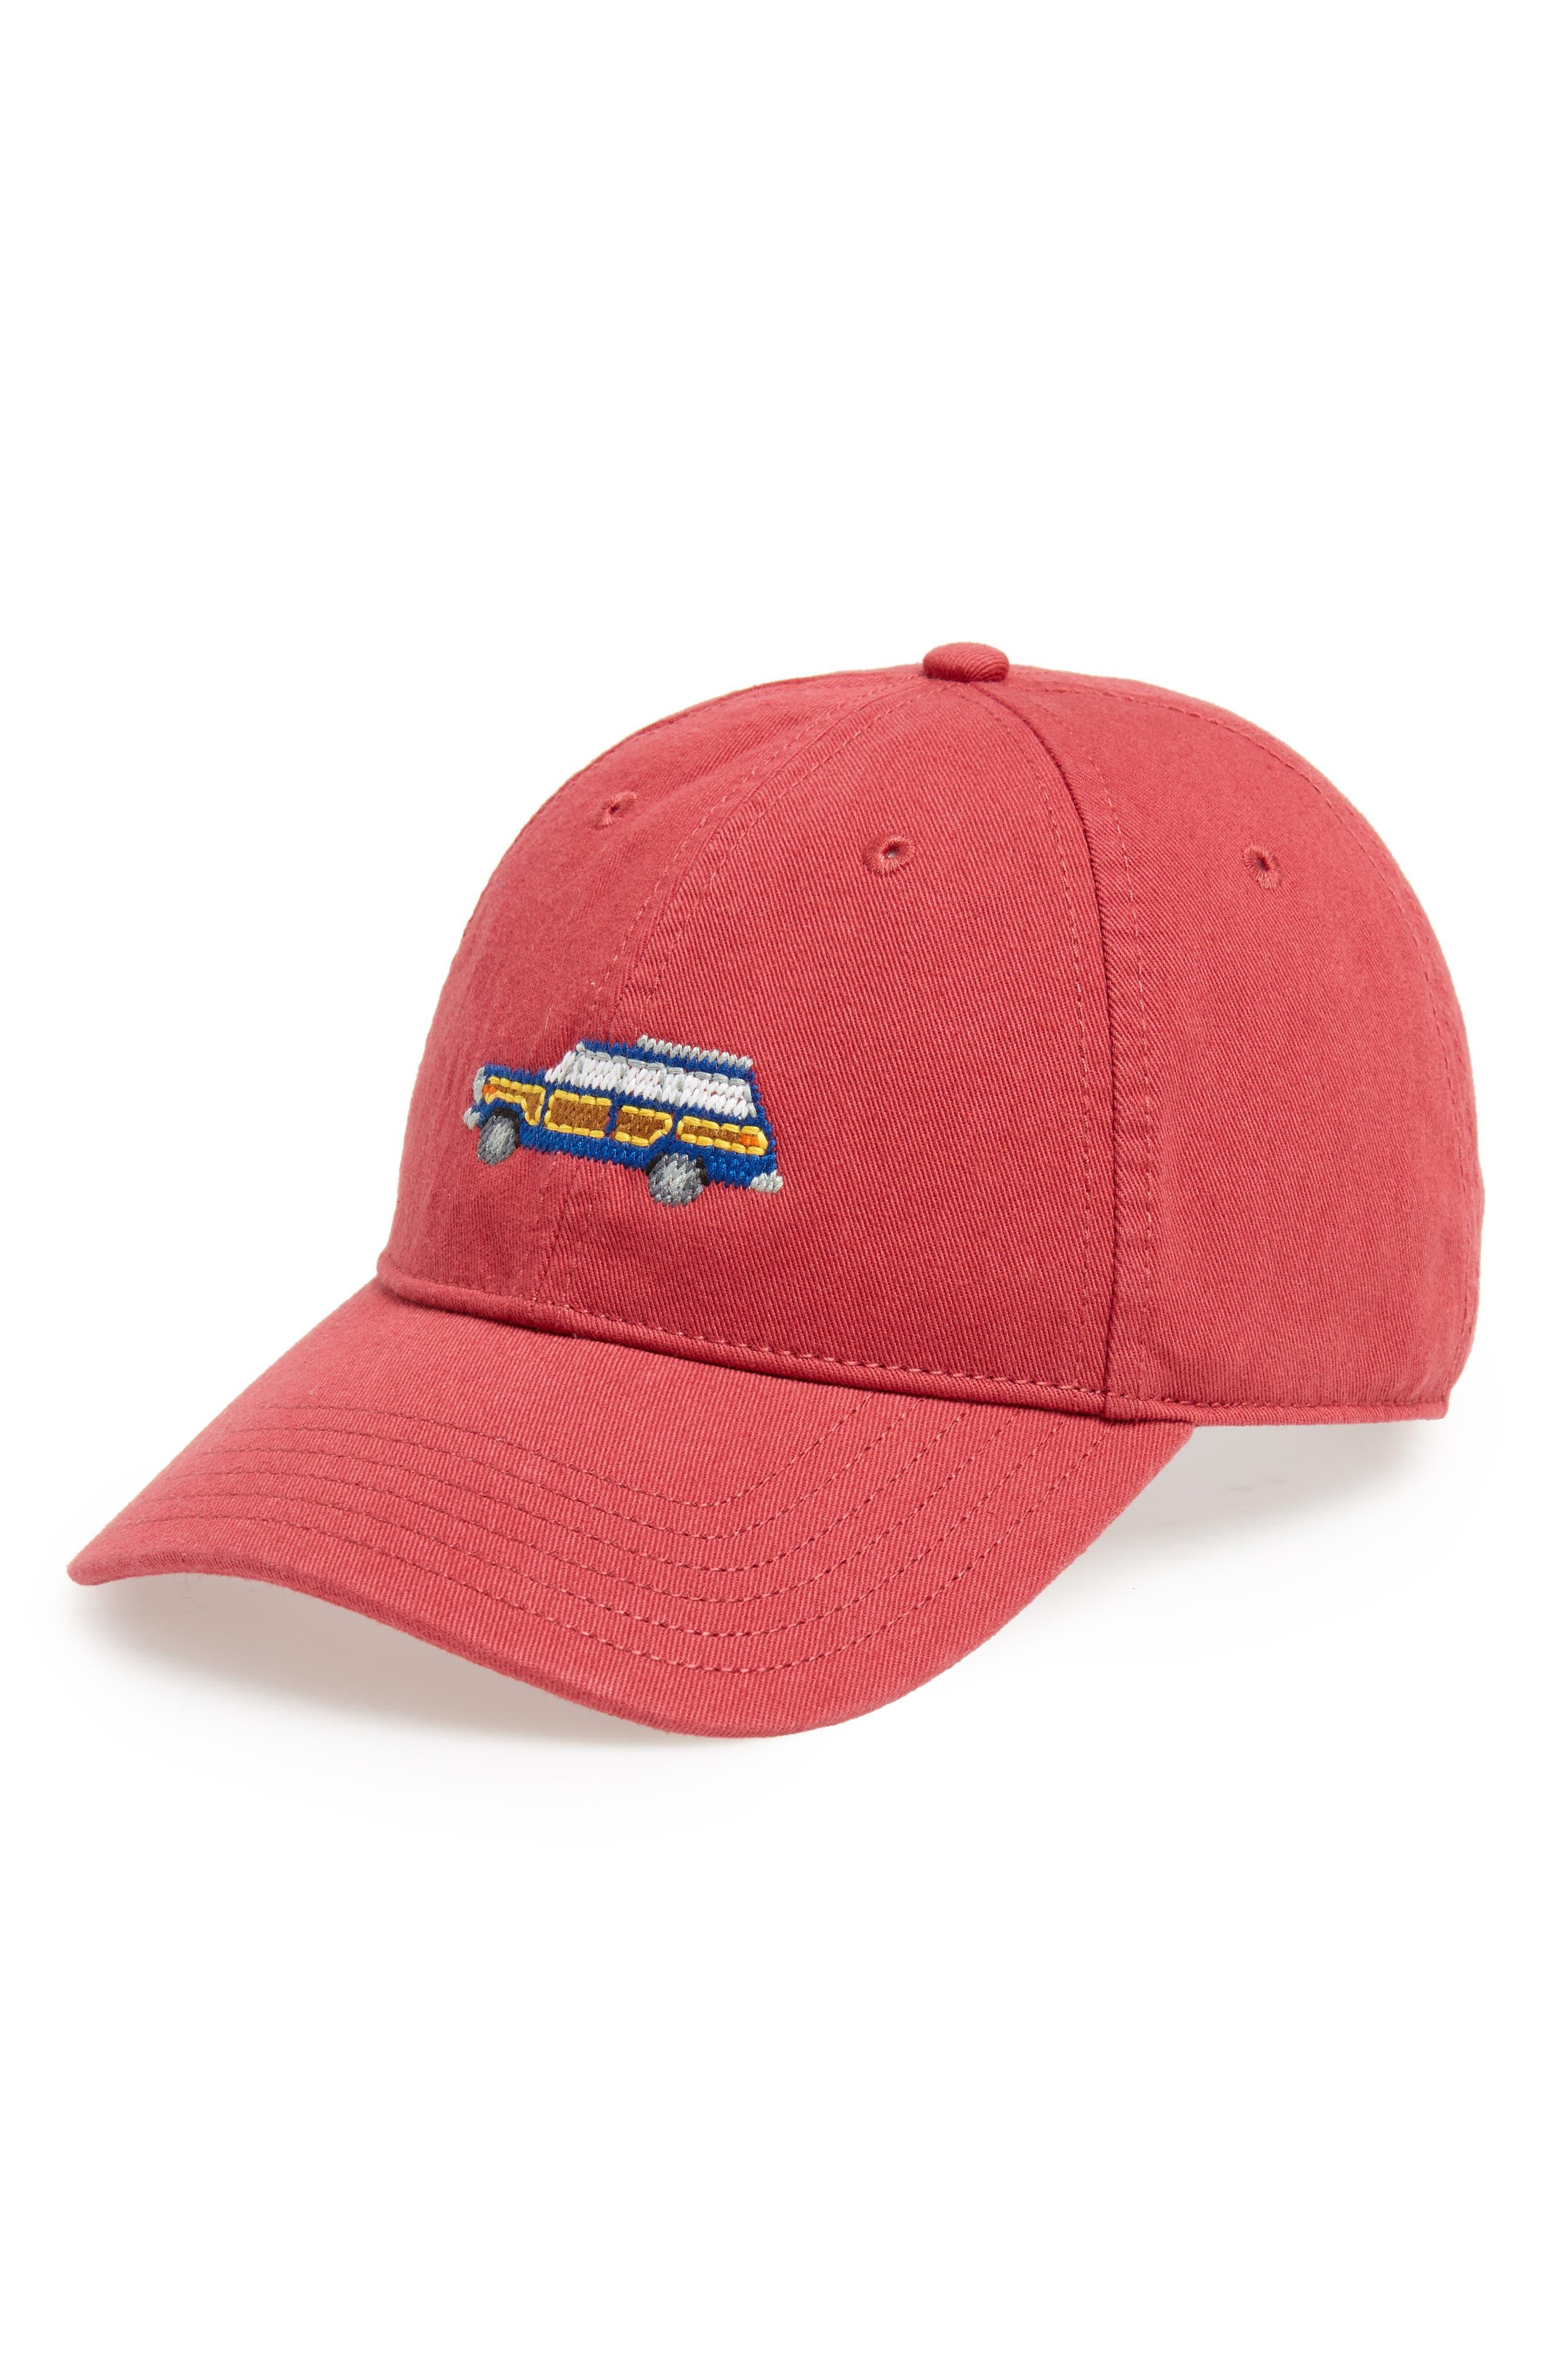 New Grand Wagoneer Baseball Cap,                             Main thumbnail 1, color,                             WEATHERED RED